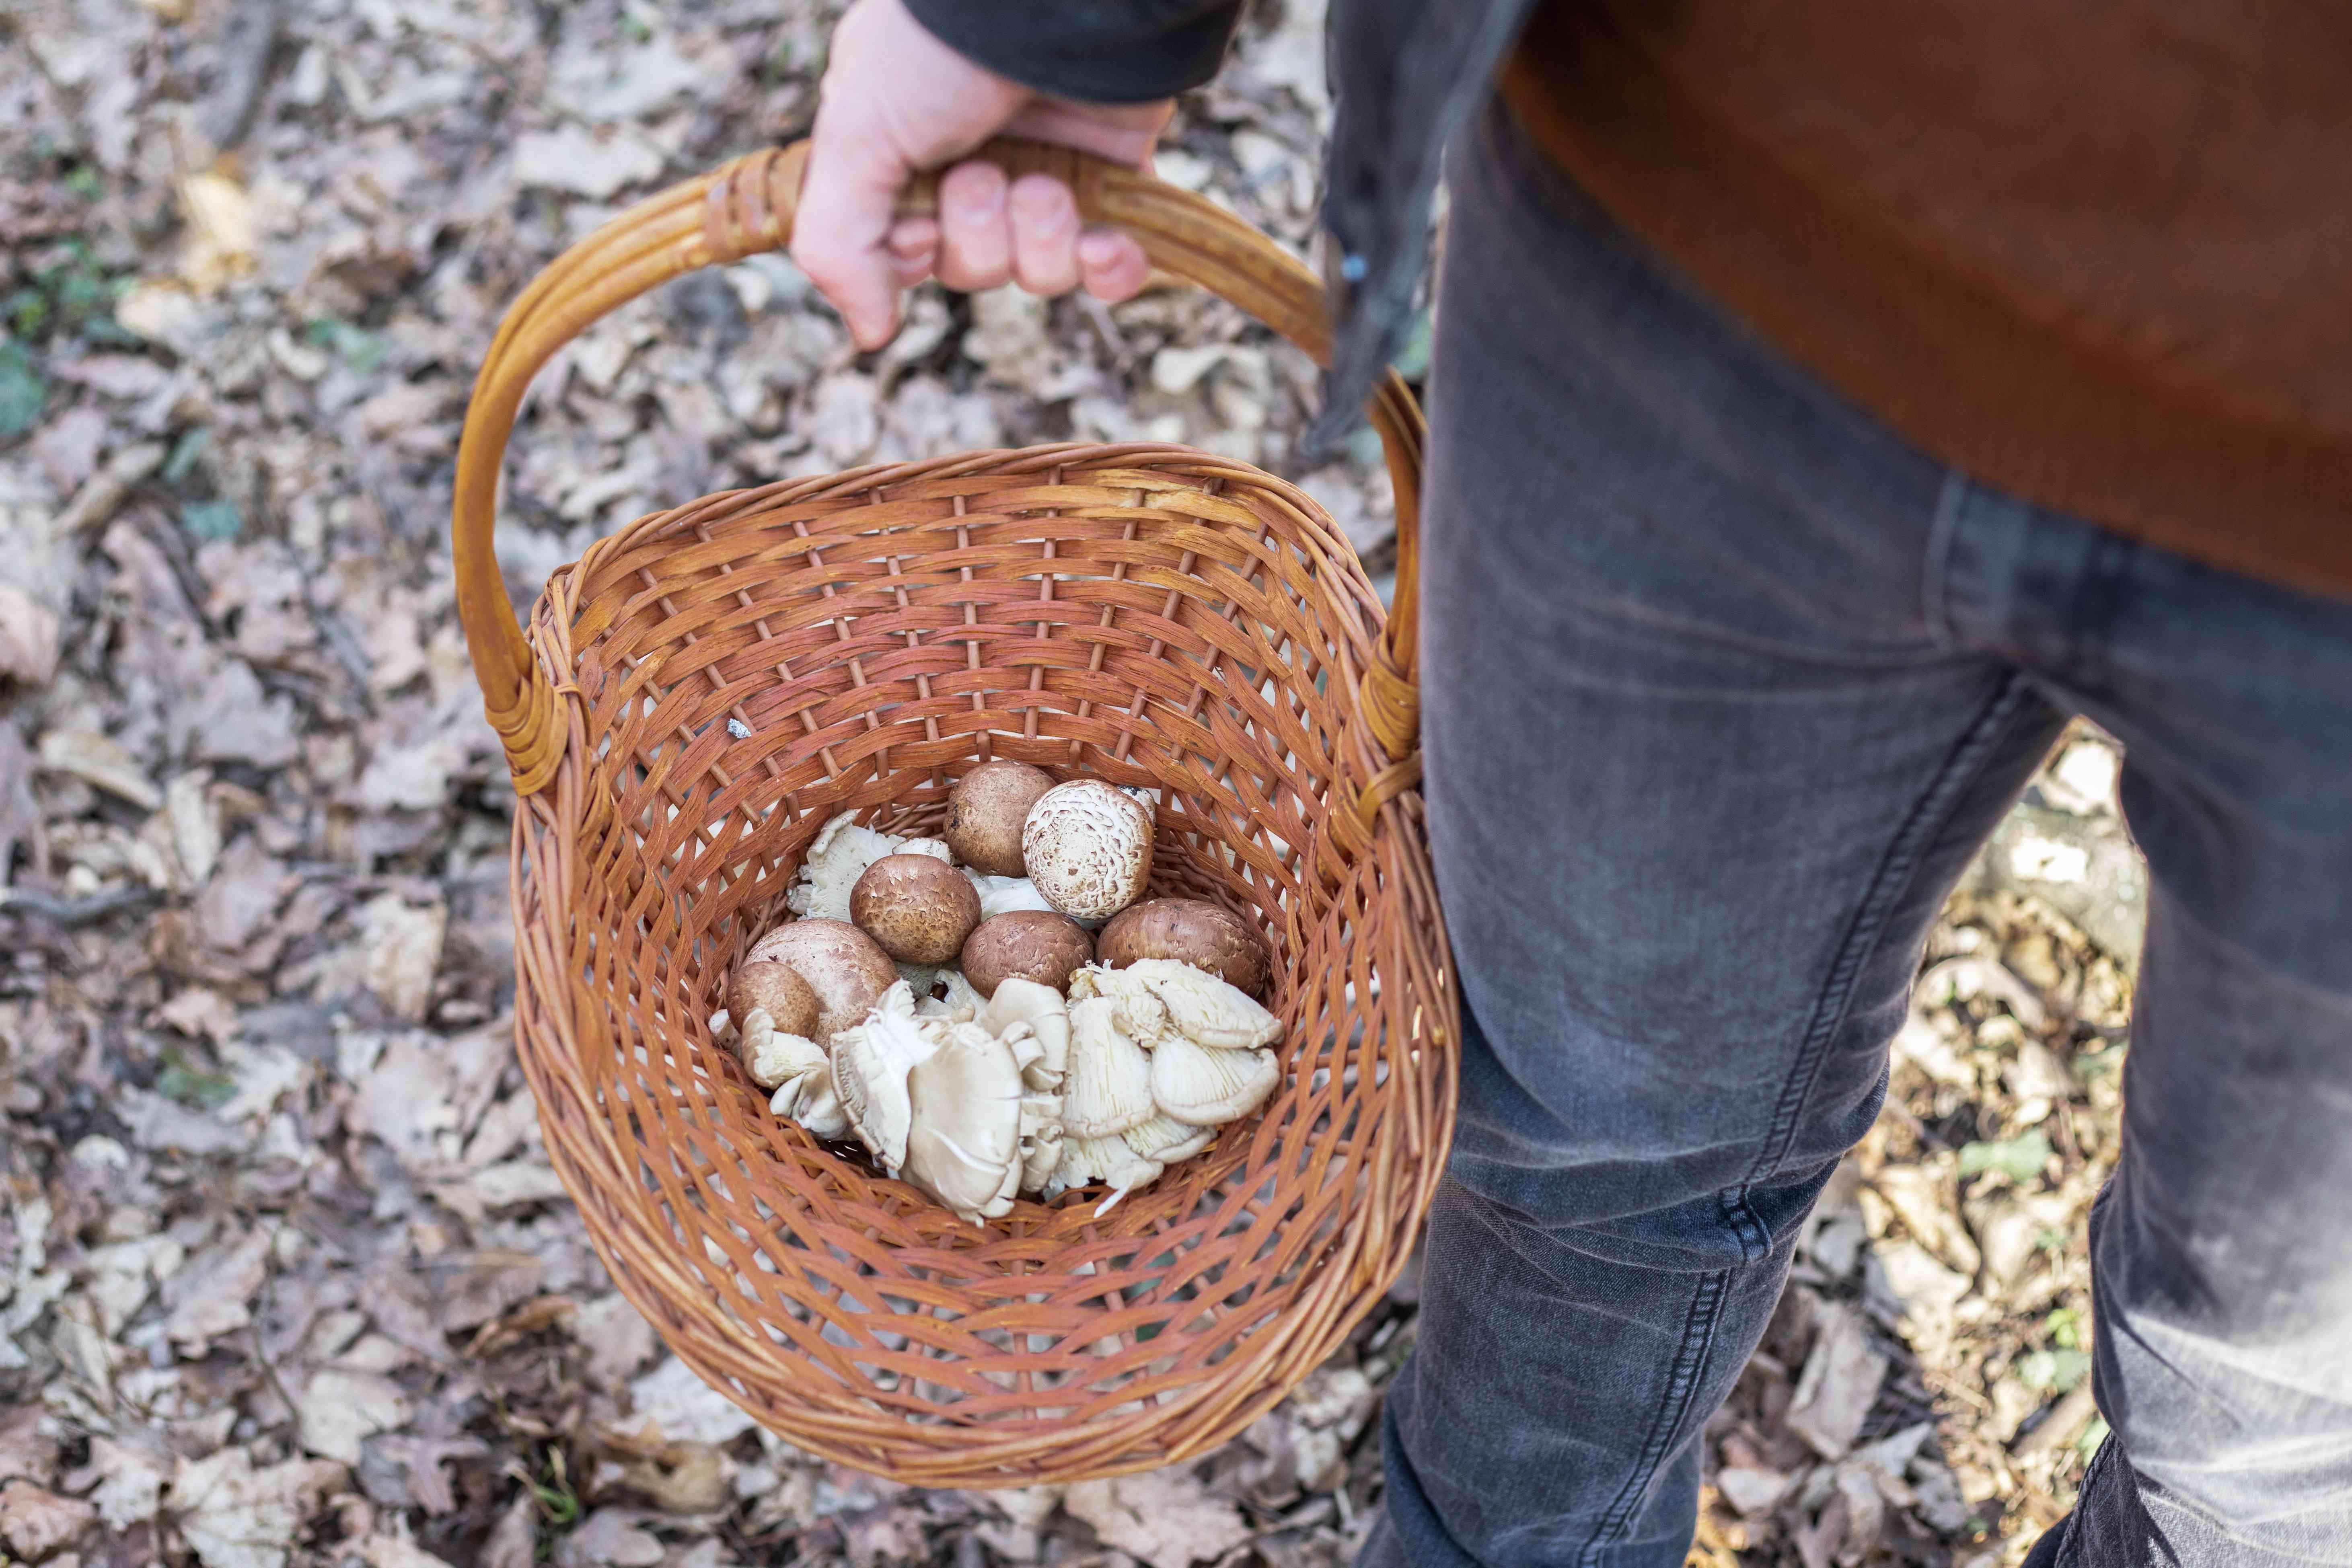 overhead shot of hiker carrying a wicker basket of various mushrooms